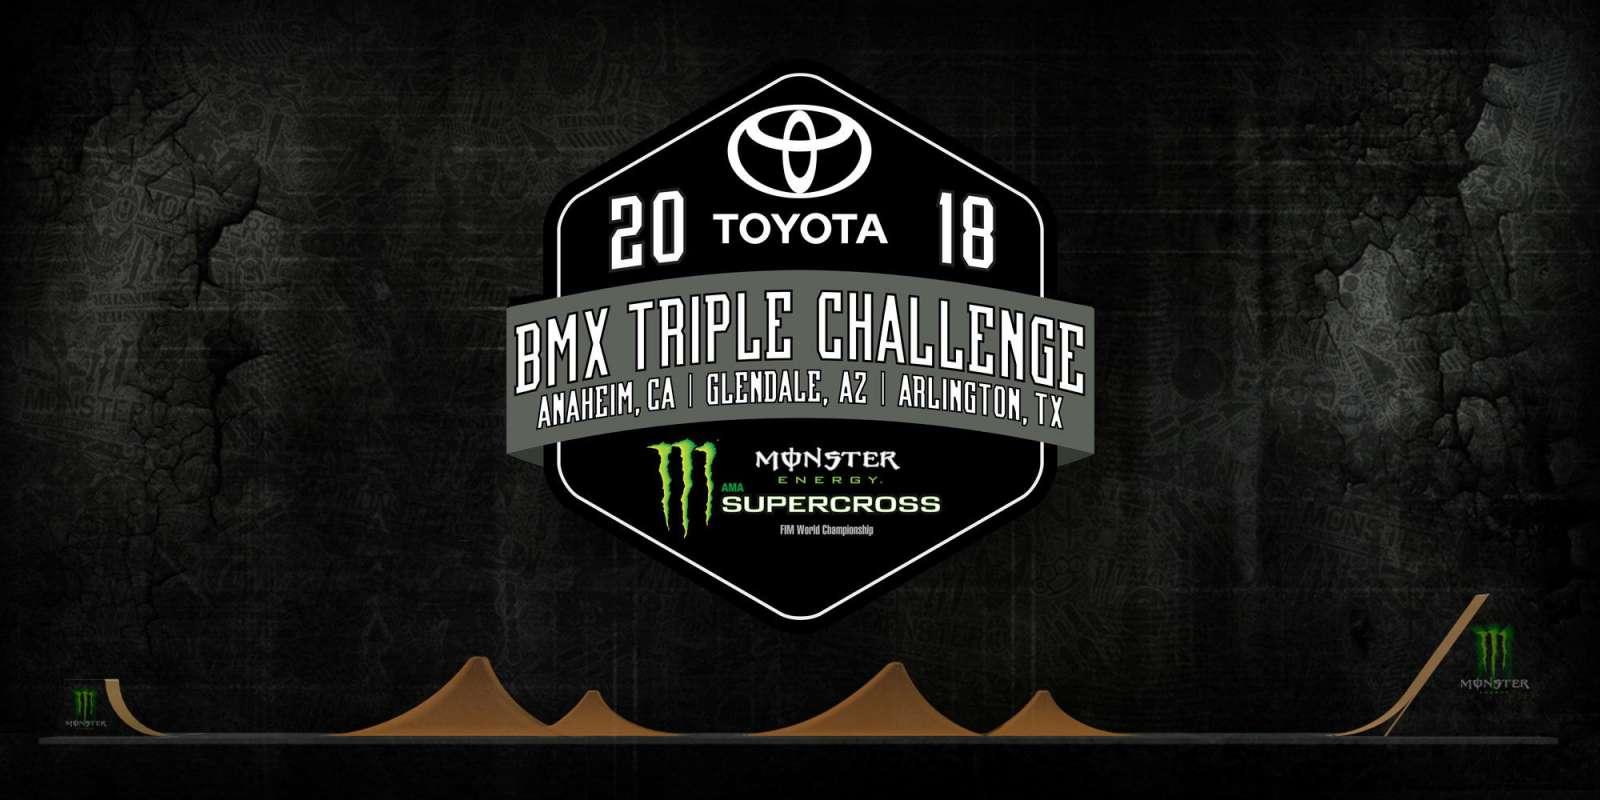 2018 Web Hero Image for BMX Triple Challenge